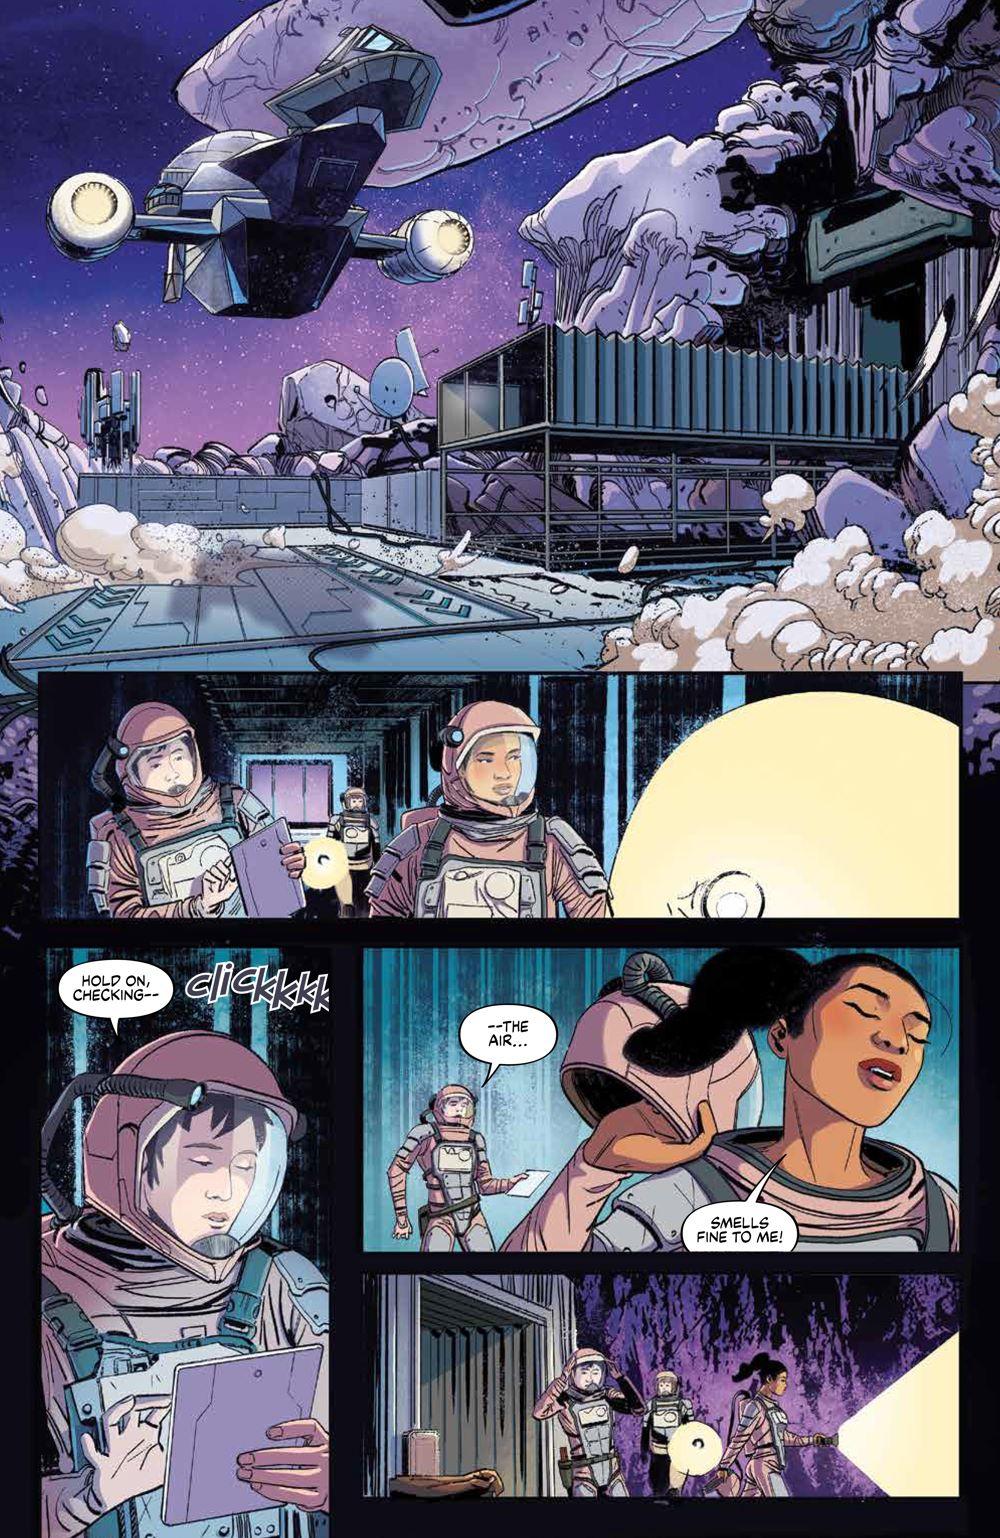 Firefly_BrandNewVerse_005_PRESS_3 ComicList Previews: FIREFLY BRAND NEW 'VERSE #5 (OF 6)